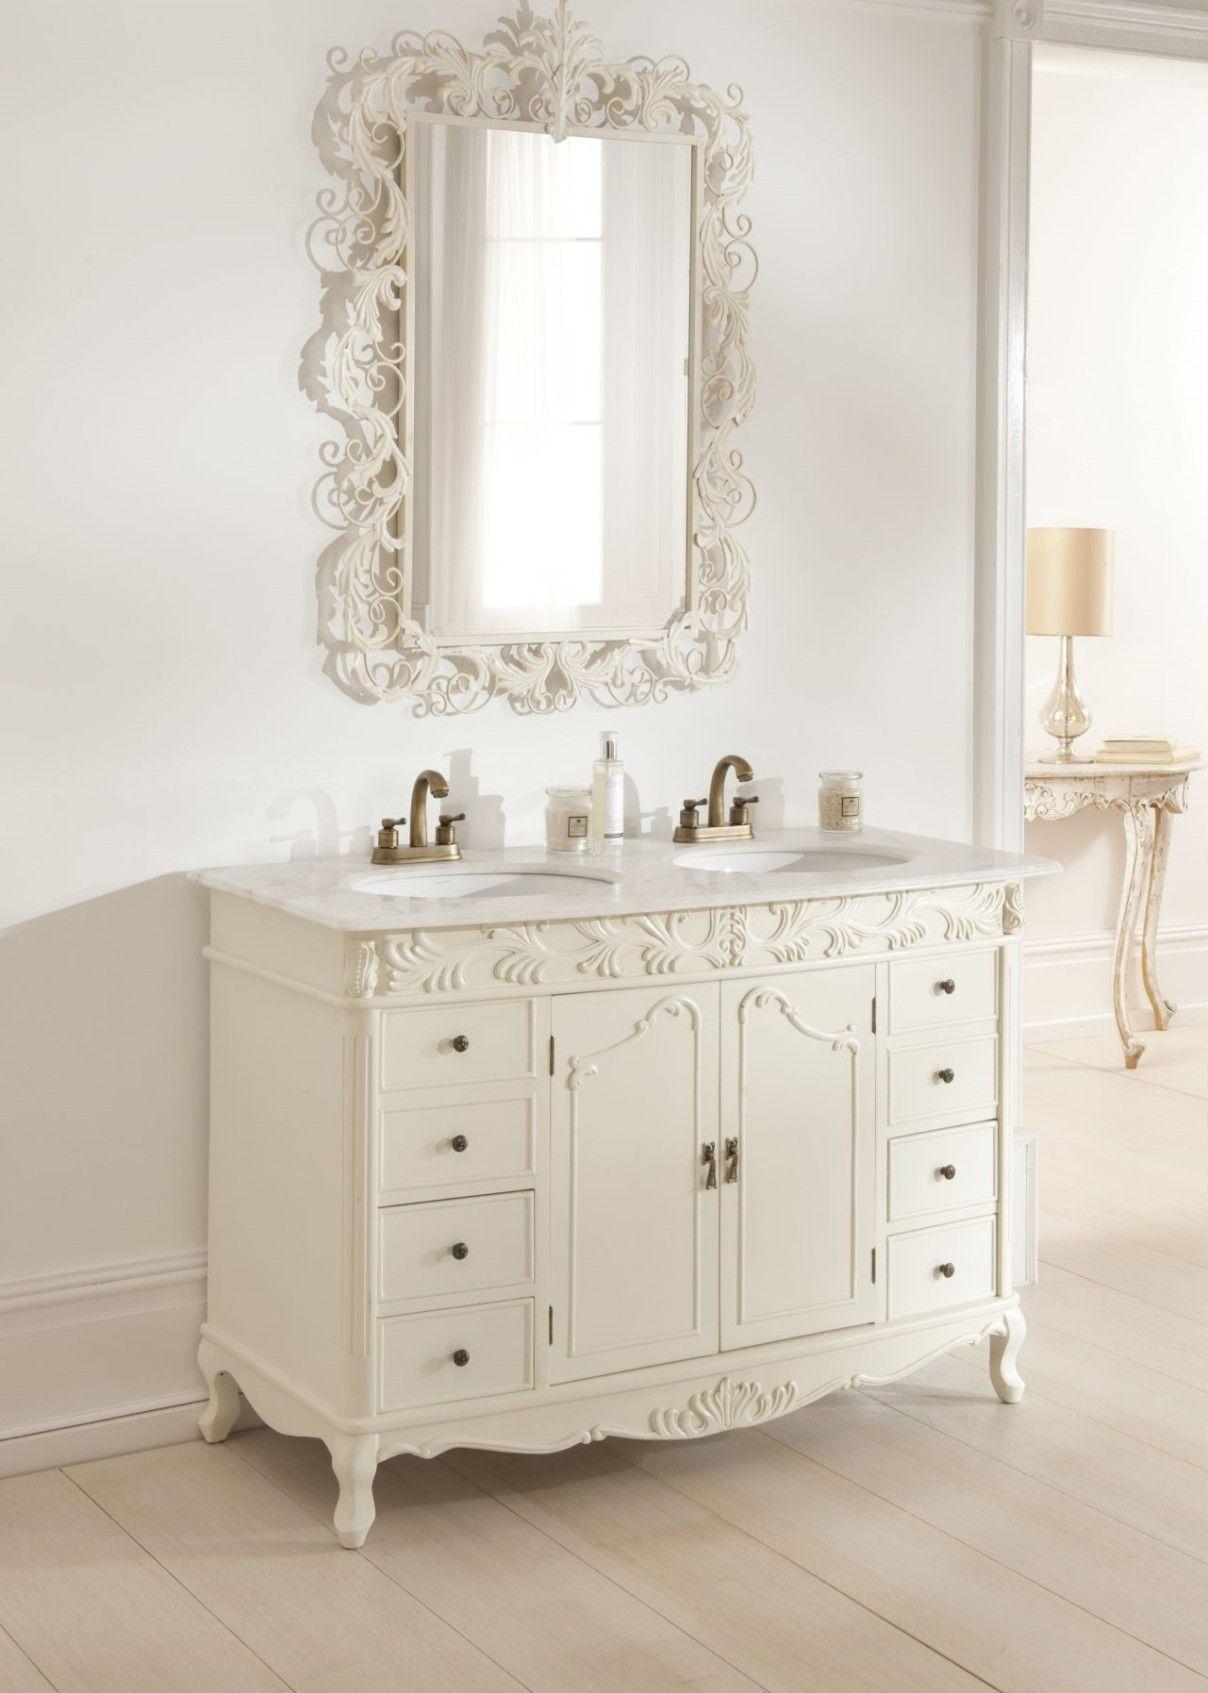 Badezimmer eitelkeiten 60 einzel waschbecken delicate antique double sink bathroom vanities and cabinets with